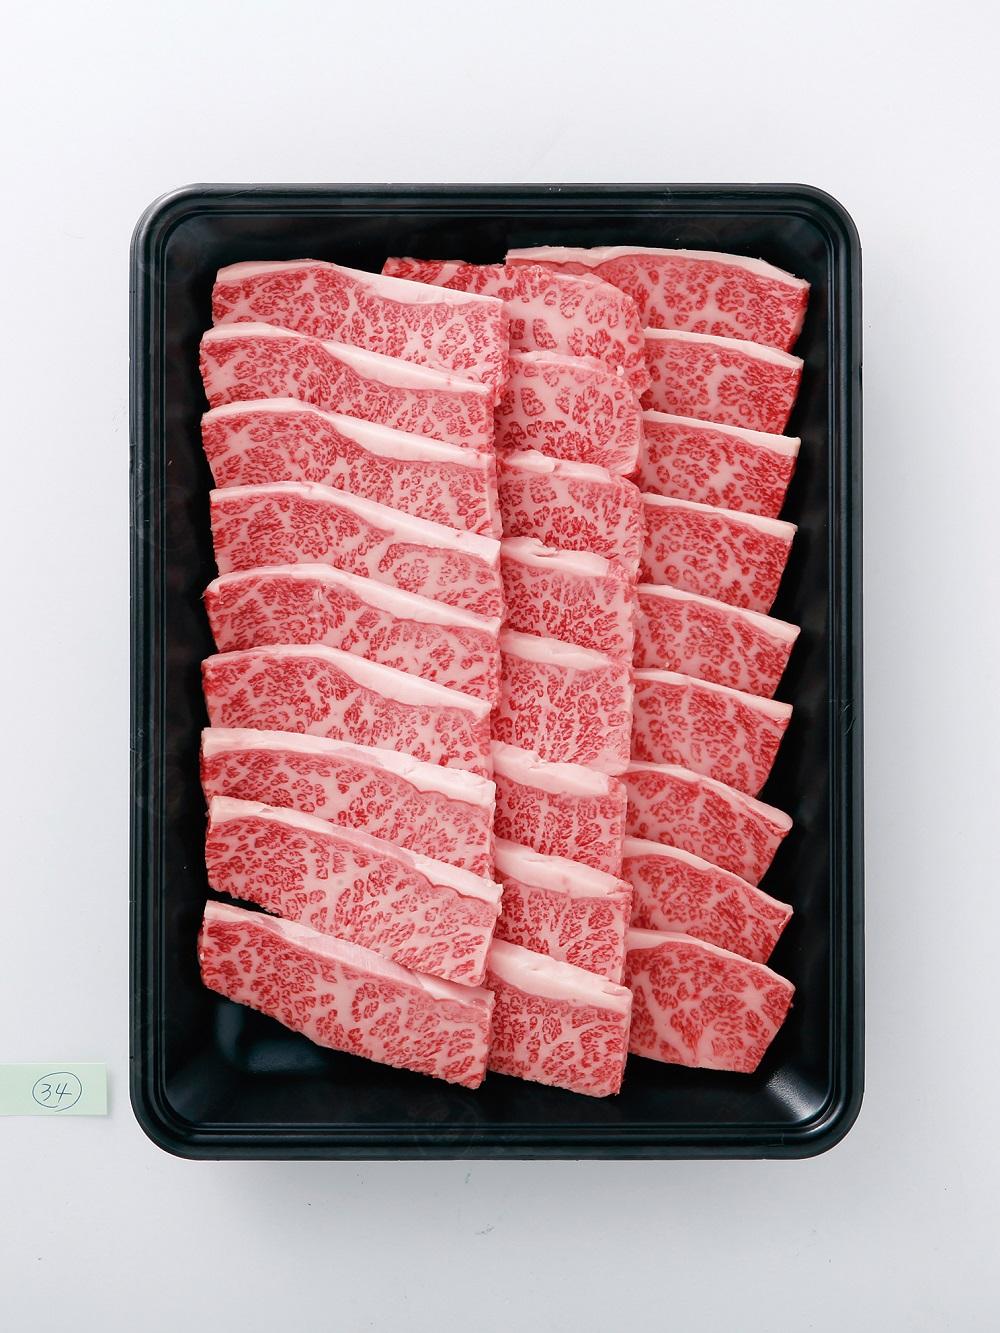 国産豊味牛<br>三角バラ焼肉用 400g